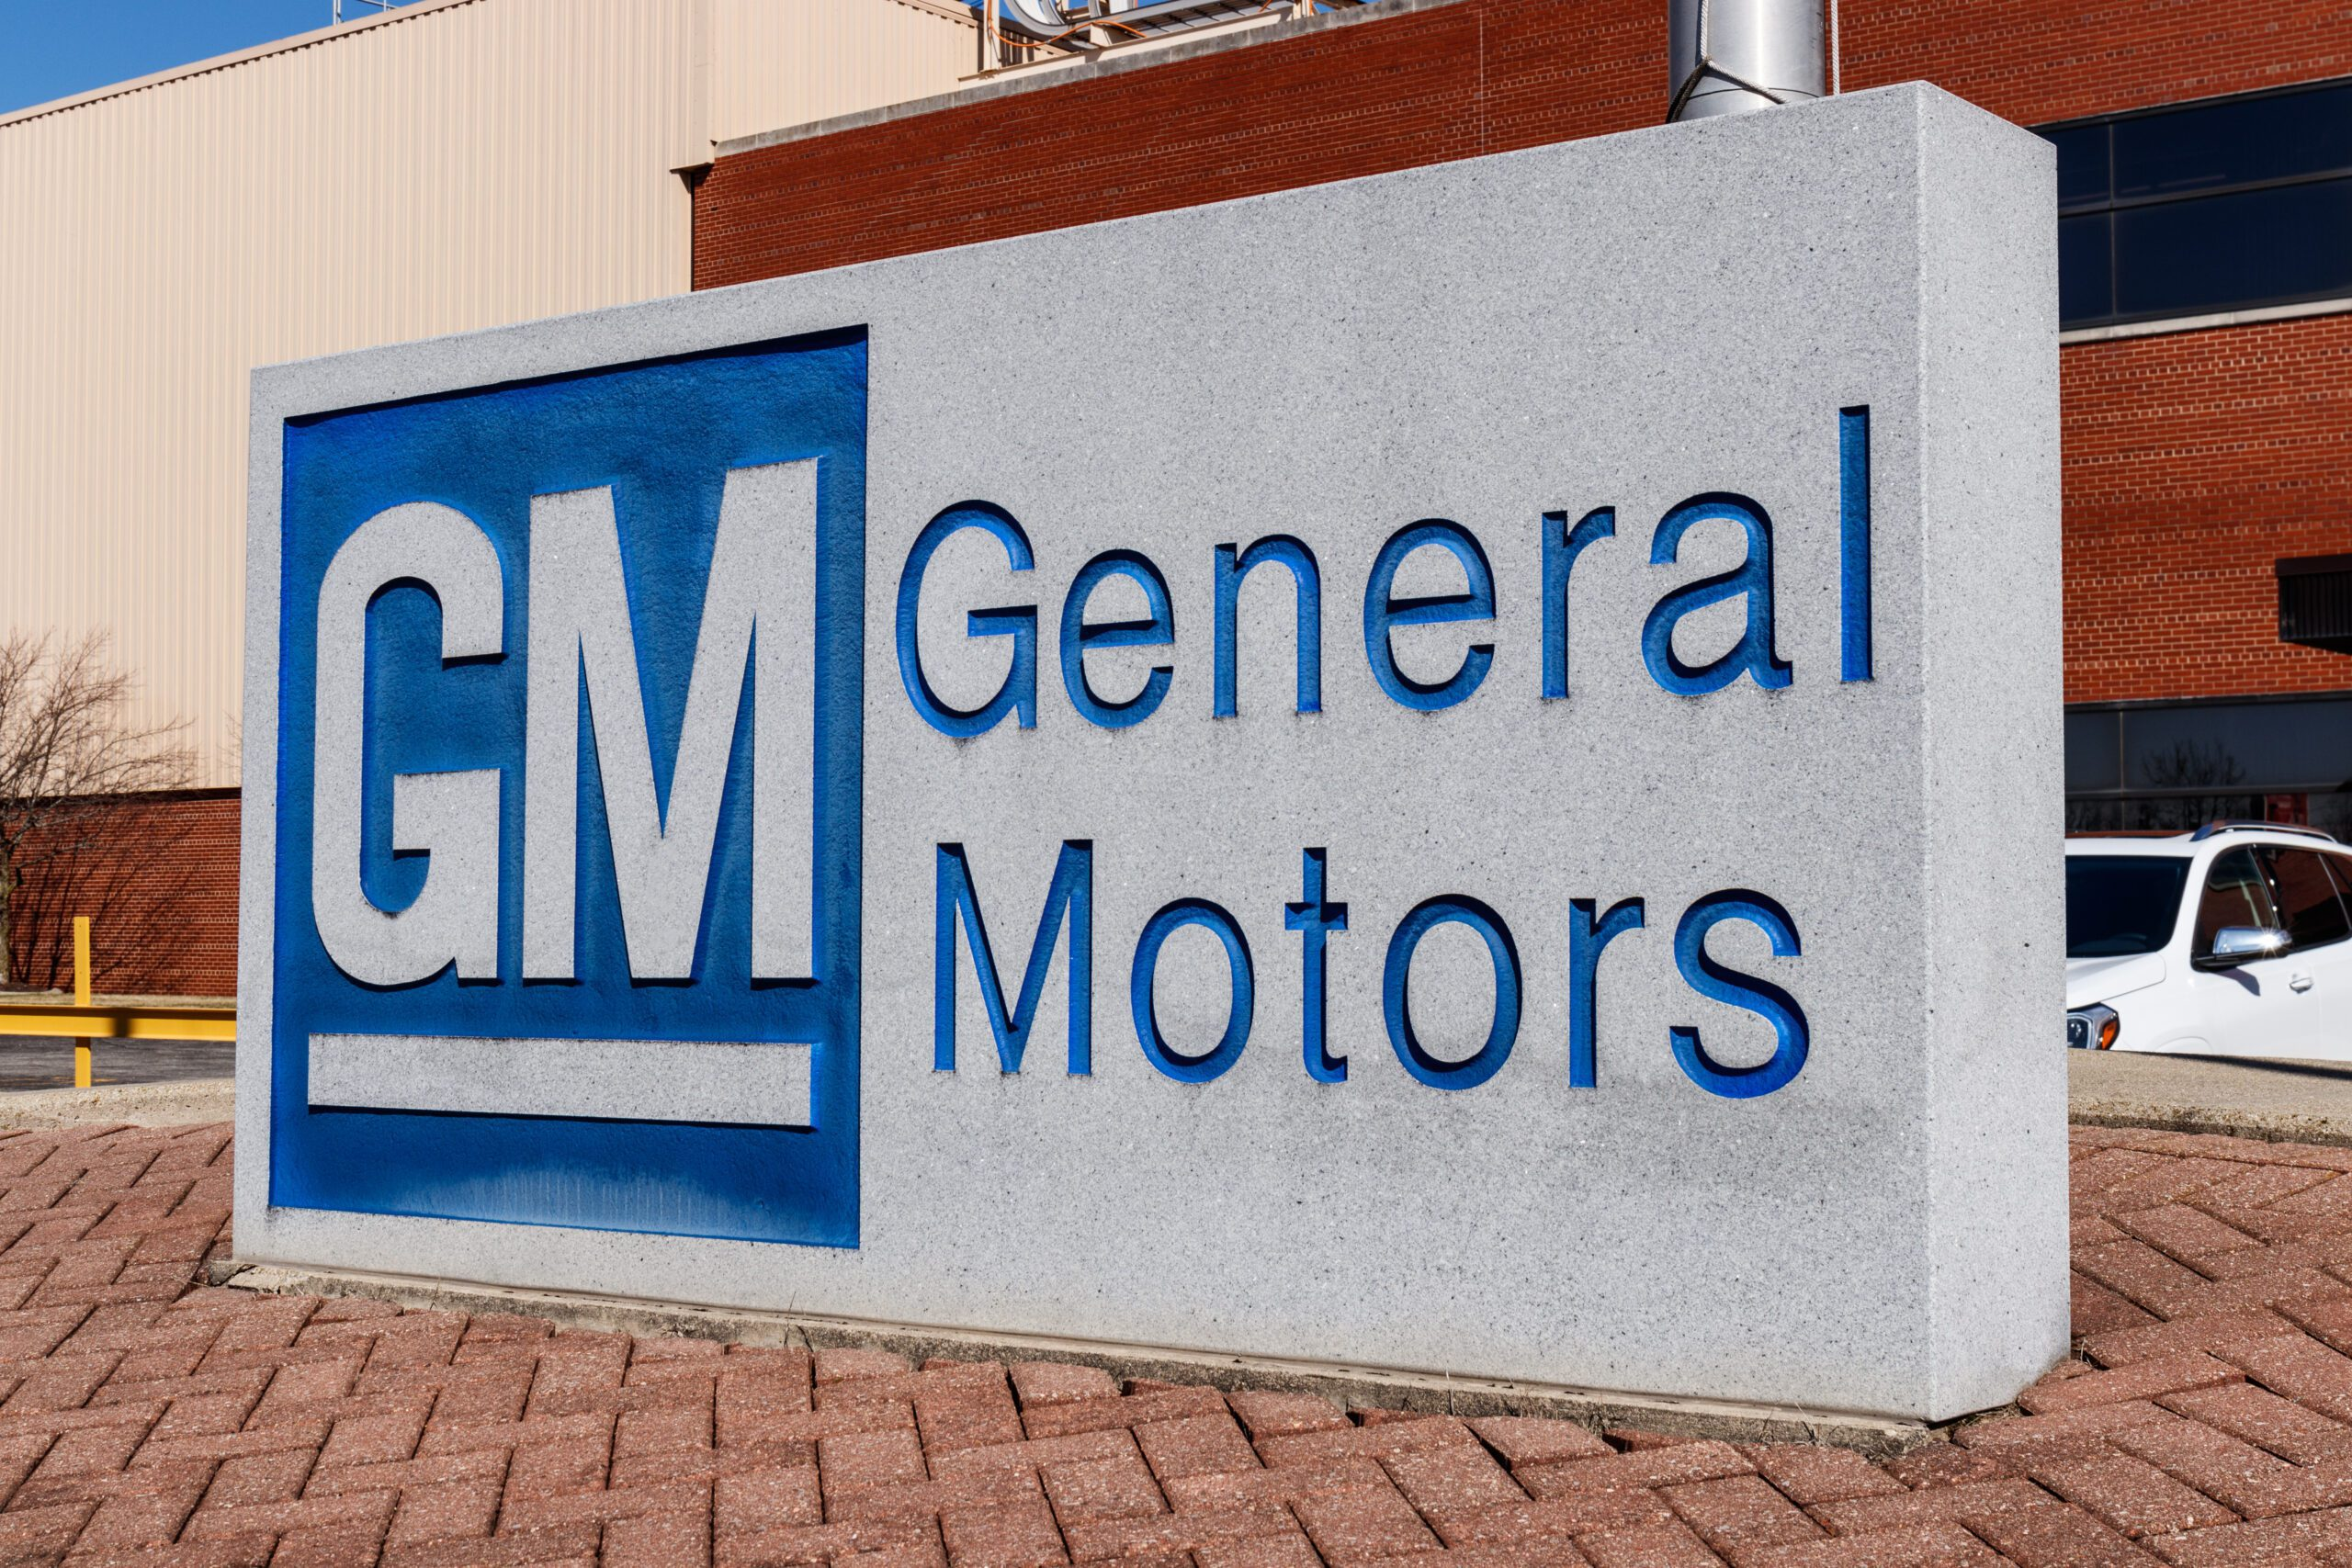 GM Shop Chair Who Helped Build Ventilators Dies of COVID